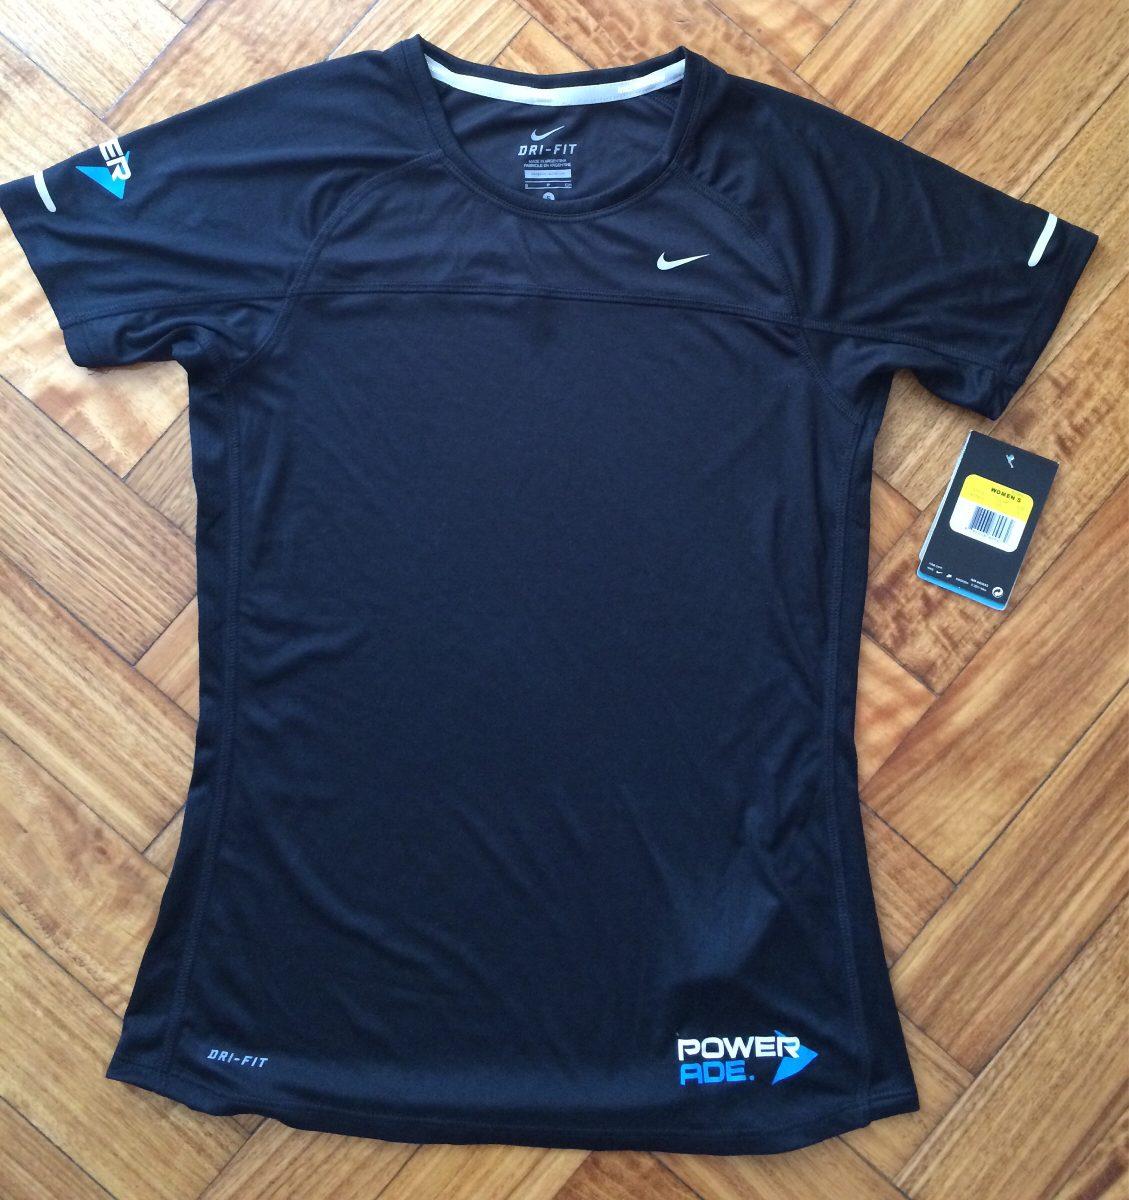 21a567f342 remera camiseta nike running dri-fit negra-talle s. Cargando zoom.